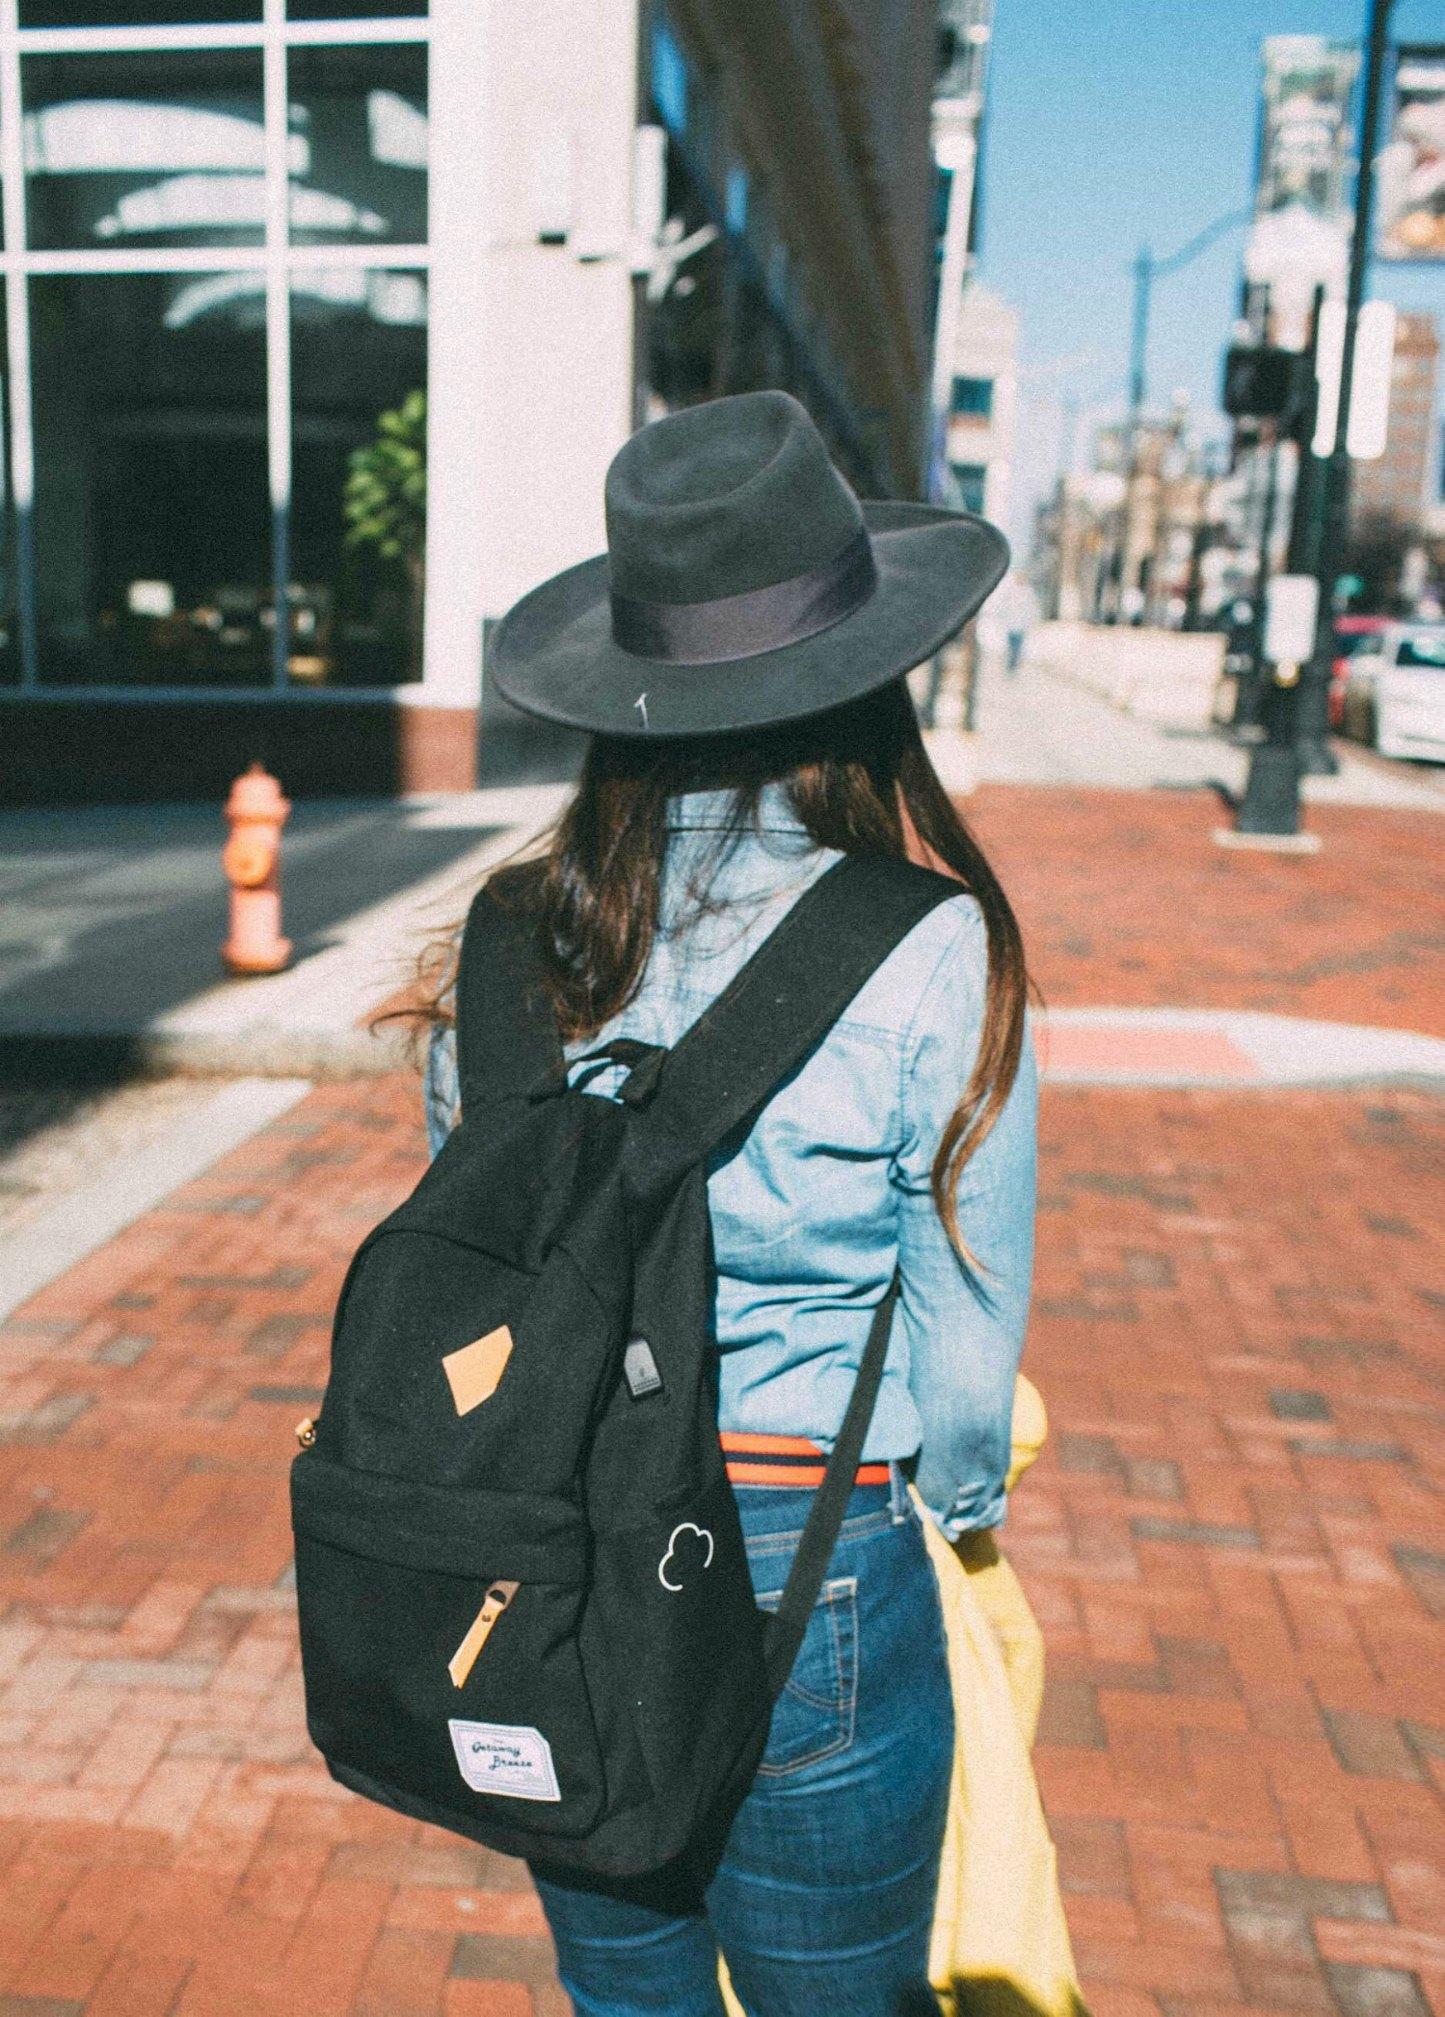 Lifestyle blog dreaming loud wearing getaway Breeze Battery Backpack